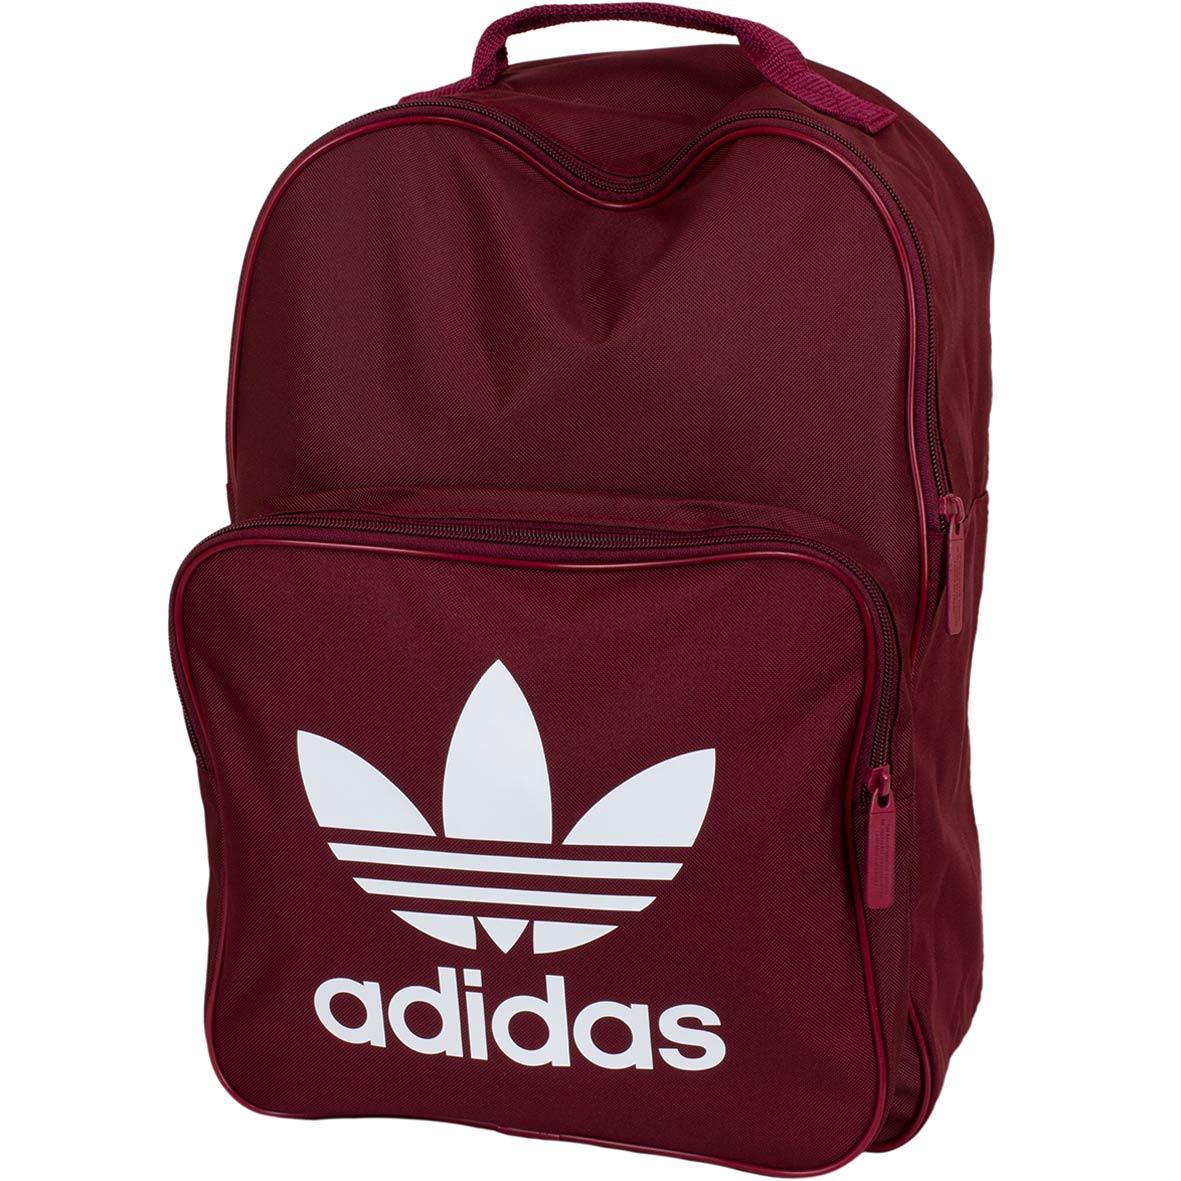 ☆ Adidas Originals Rucksack Classic Trefoil weinrot hier